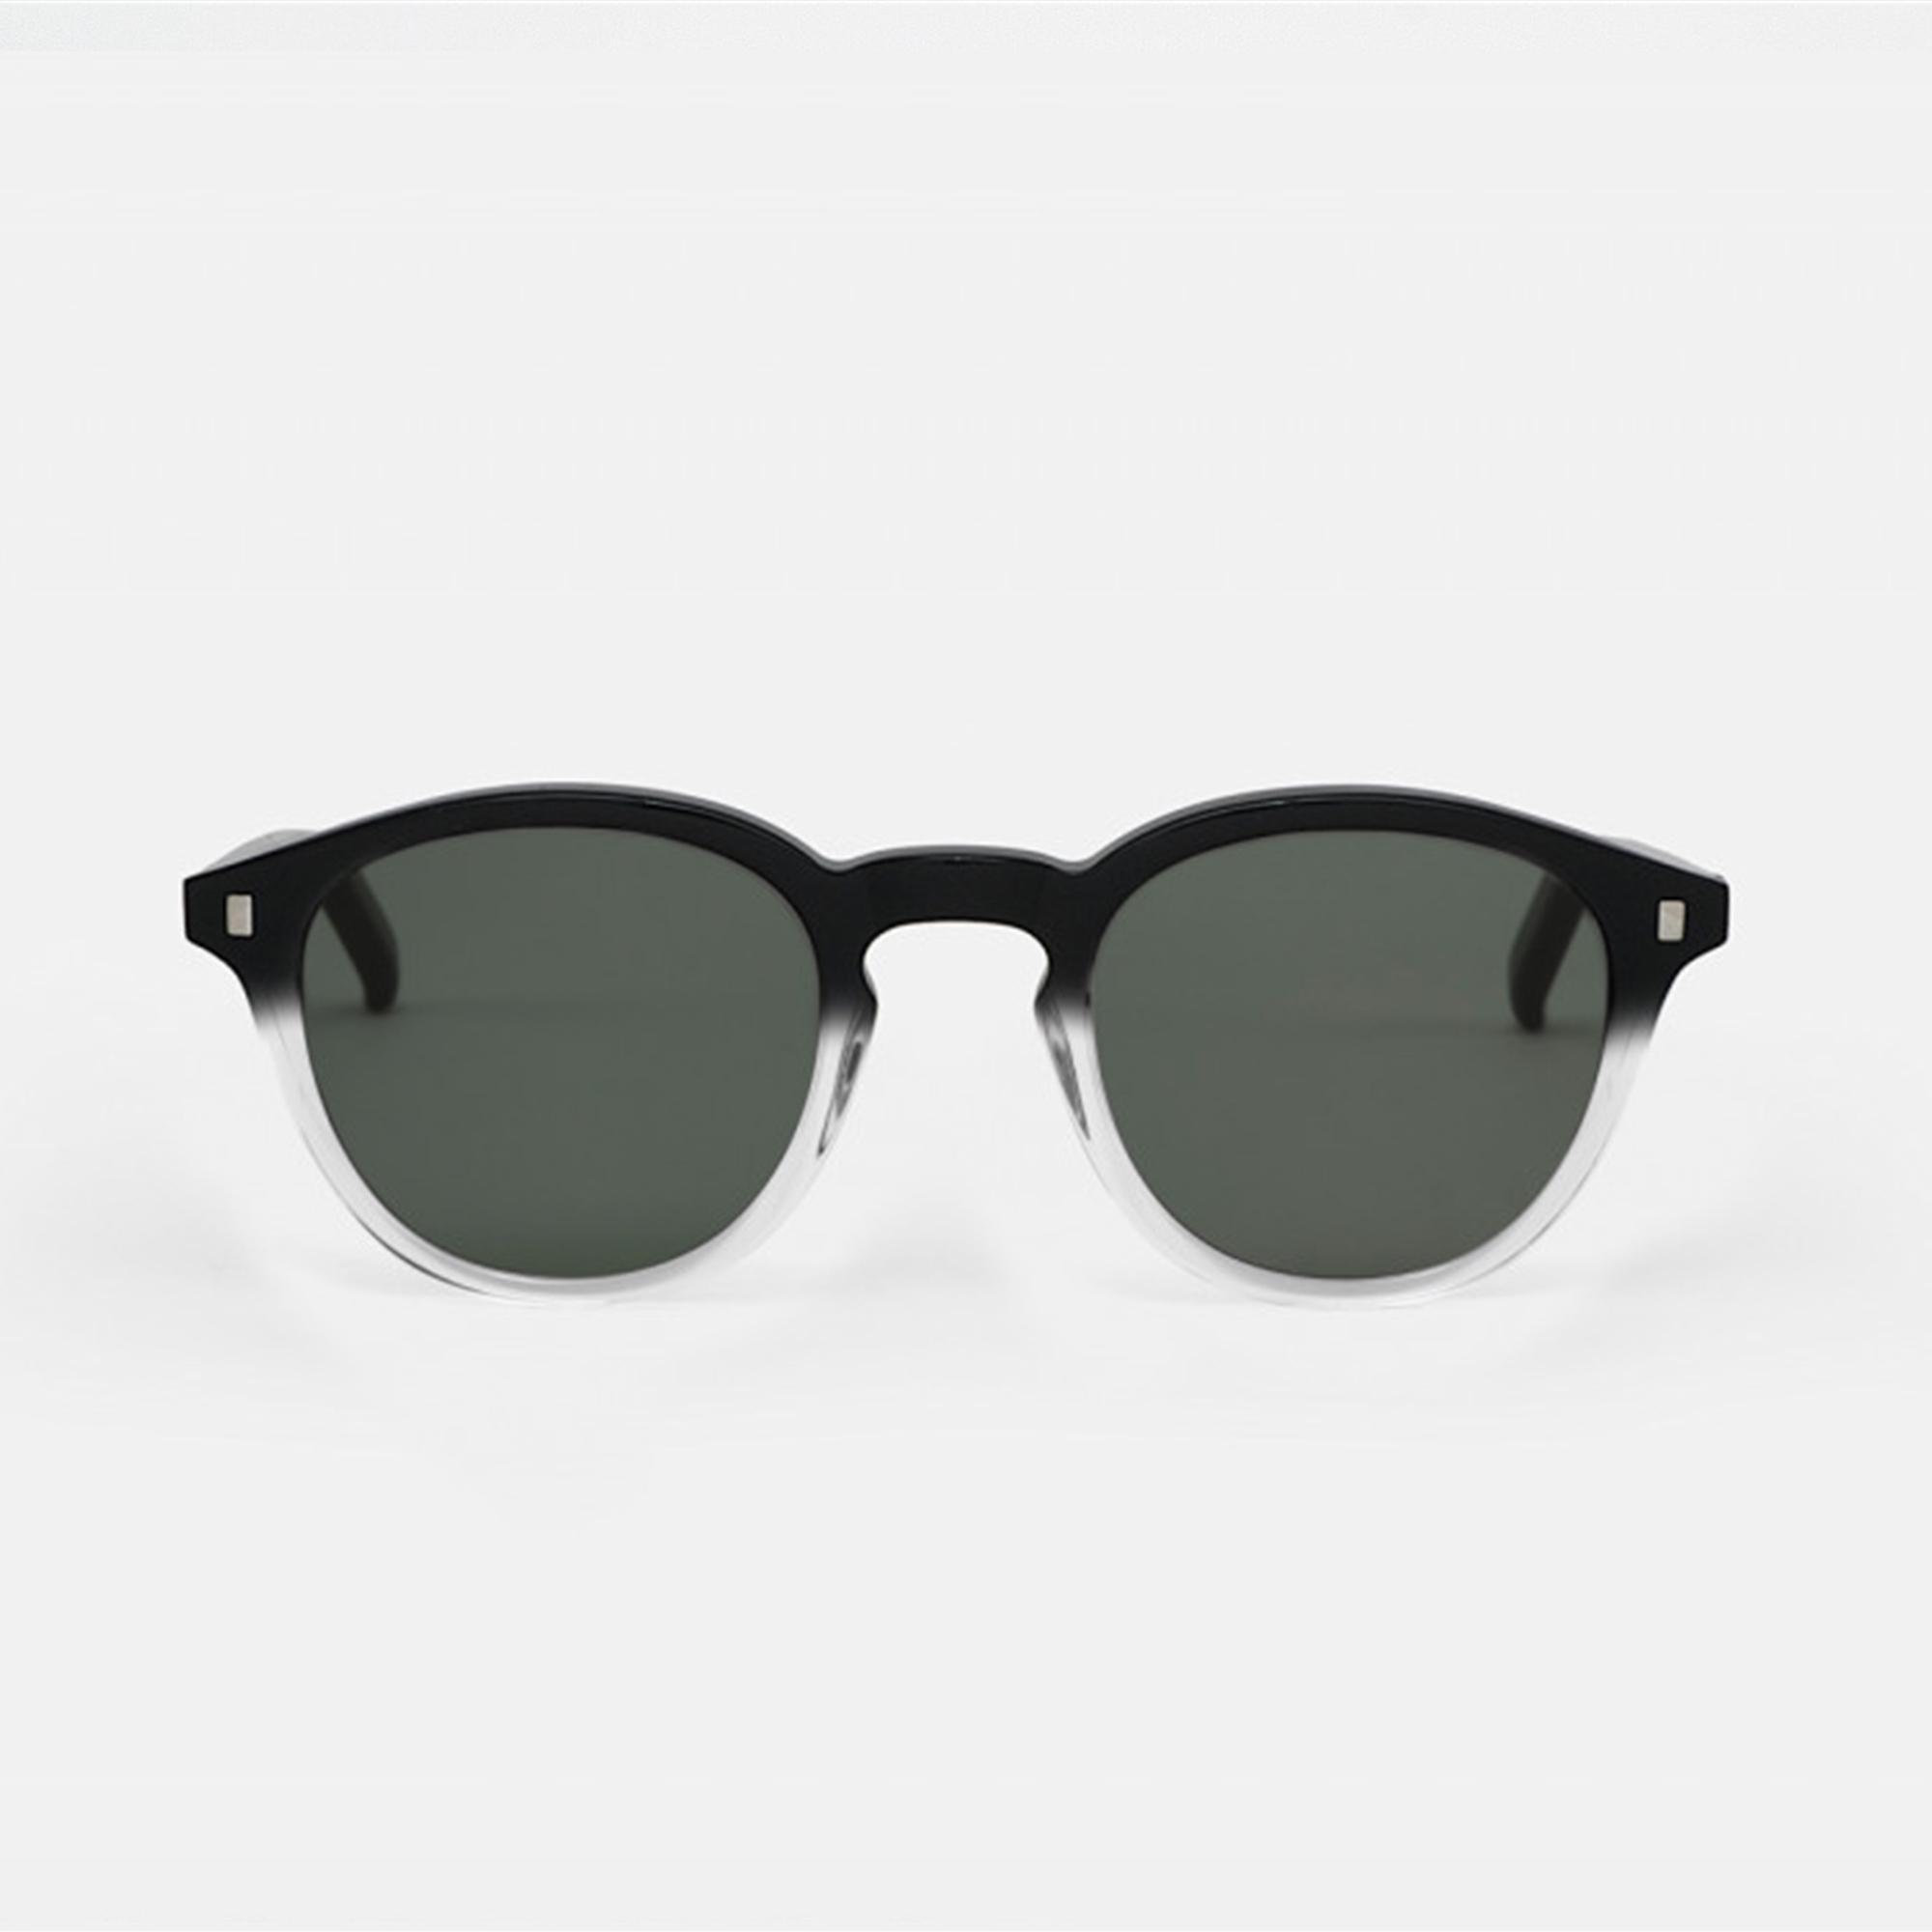 dafc92b9e9 Monokel Eyewear Nelson Sunglasses for Men - Save 14% - Lyst